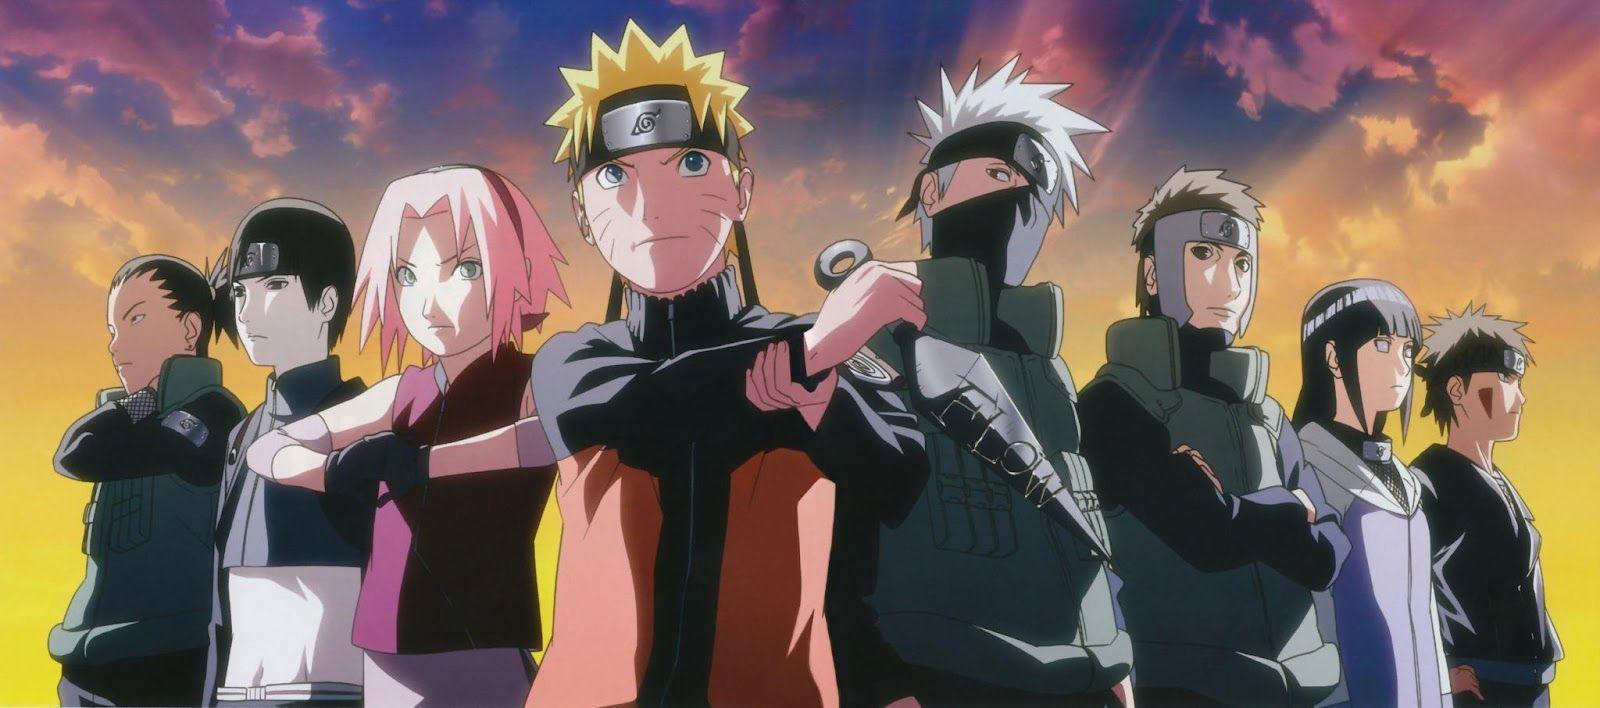 Pin By Colleen Steinbach On Anime Manga And Vocaloid Sai Naruto Naruto Images Naruto Uzumaki